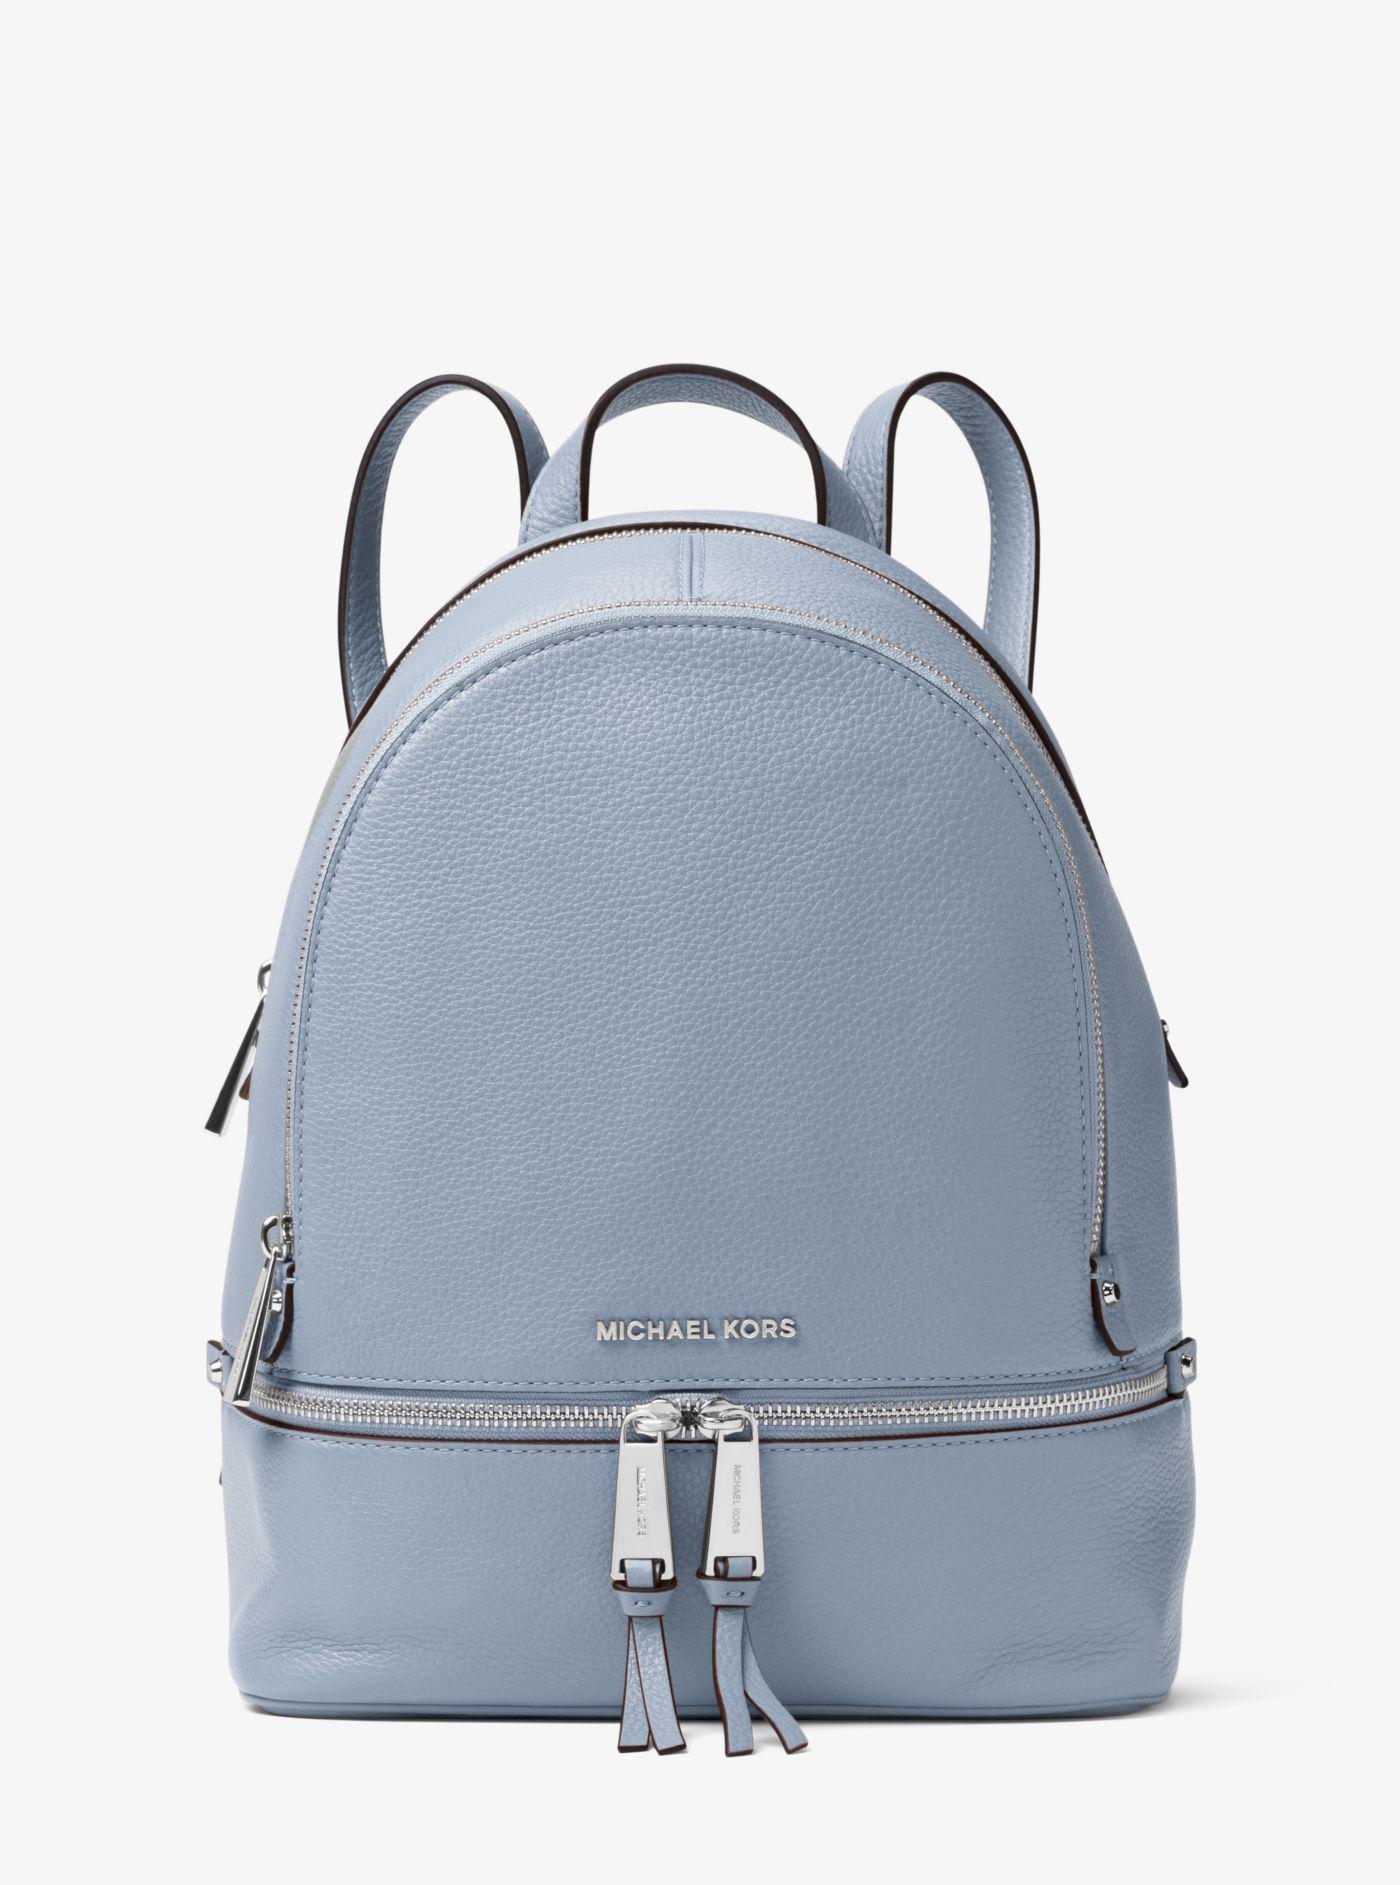 1516175a5a9c clearance michael kors blue rhea medium leather backpack lyst. view  fullscreen 05196 6d6a2